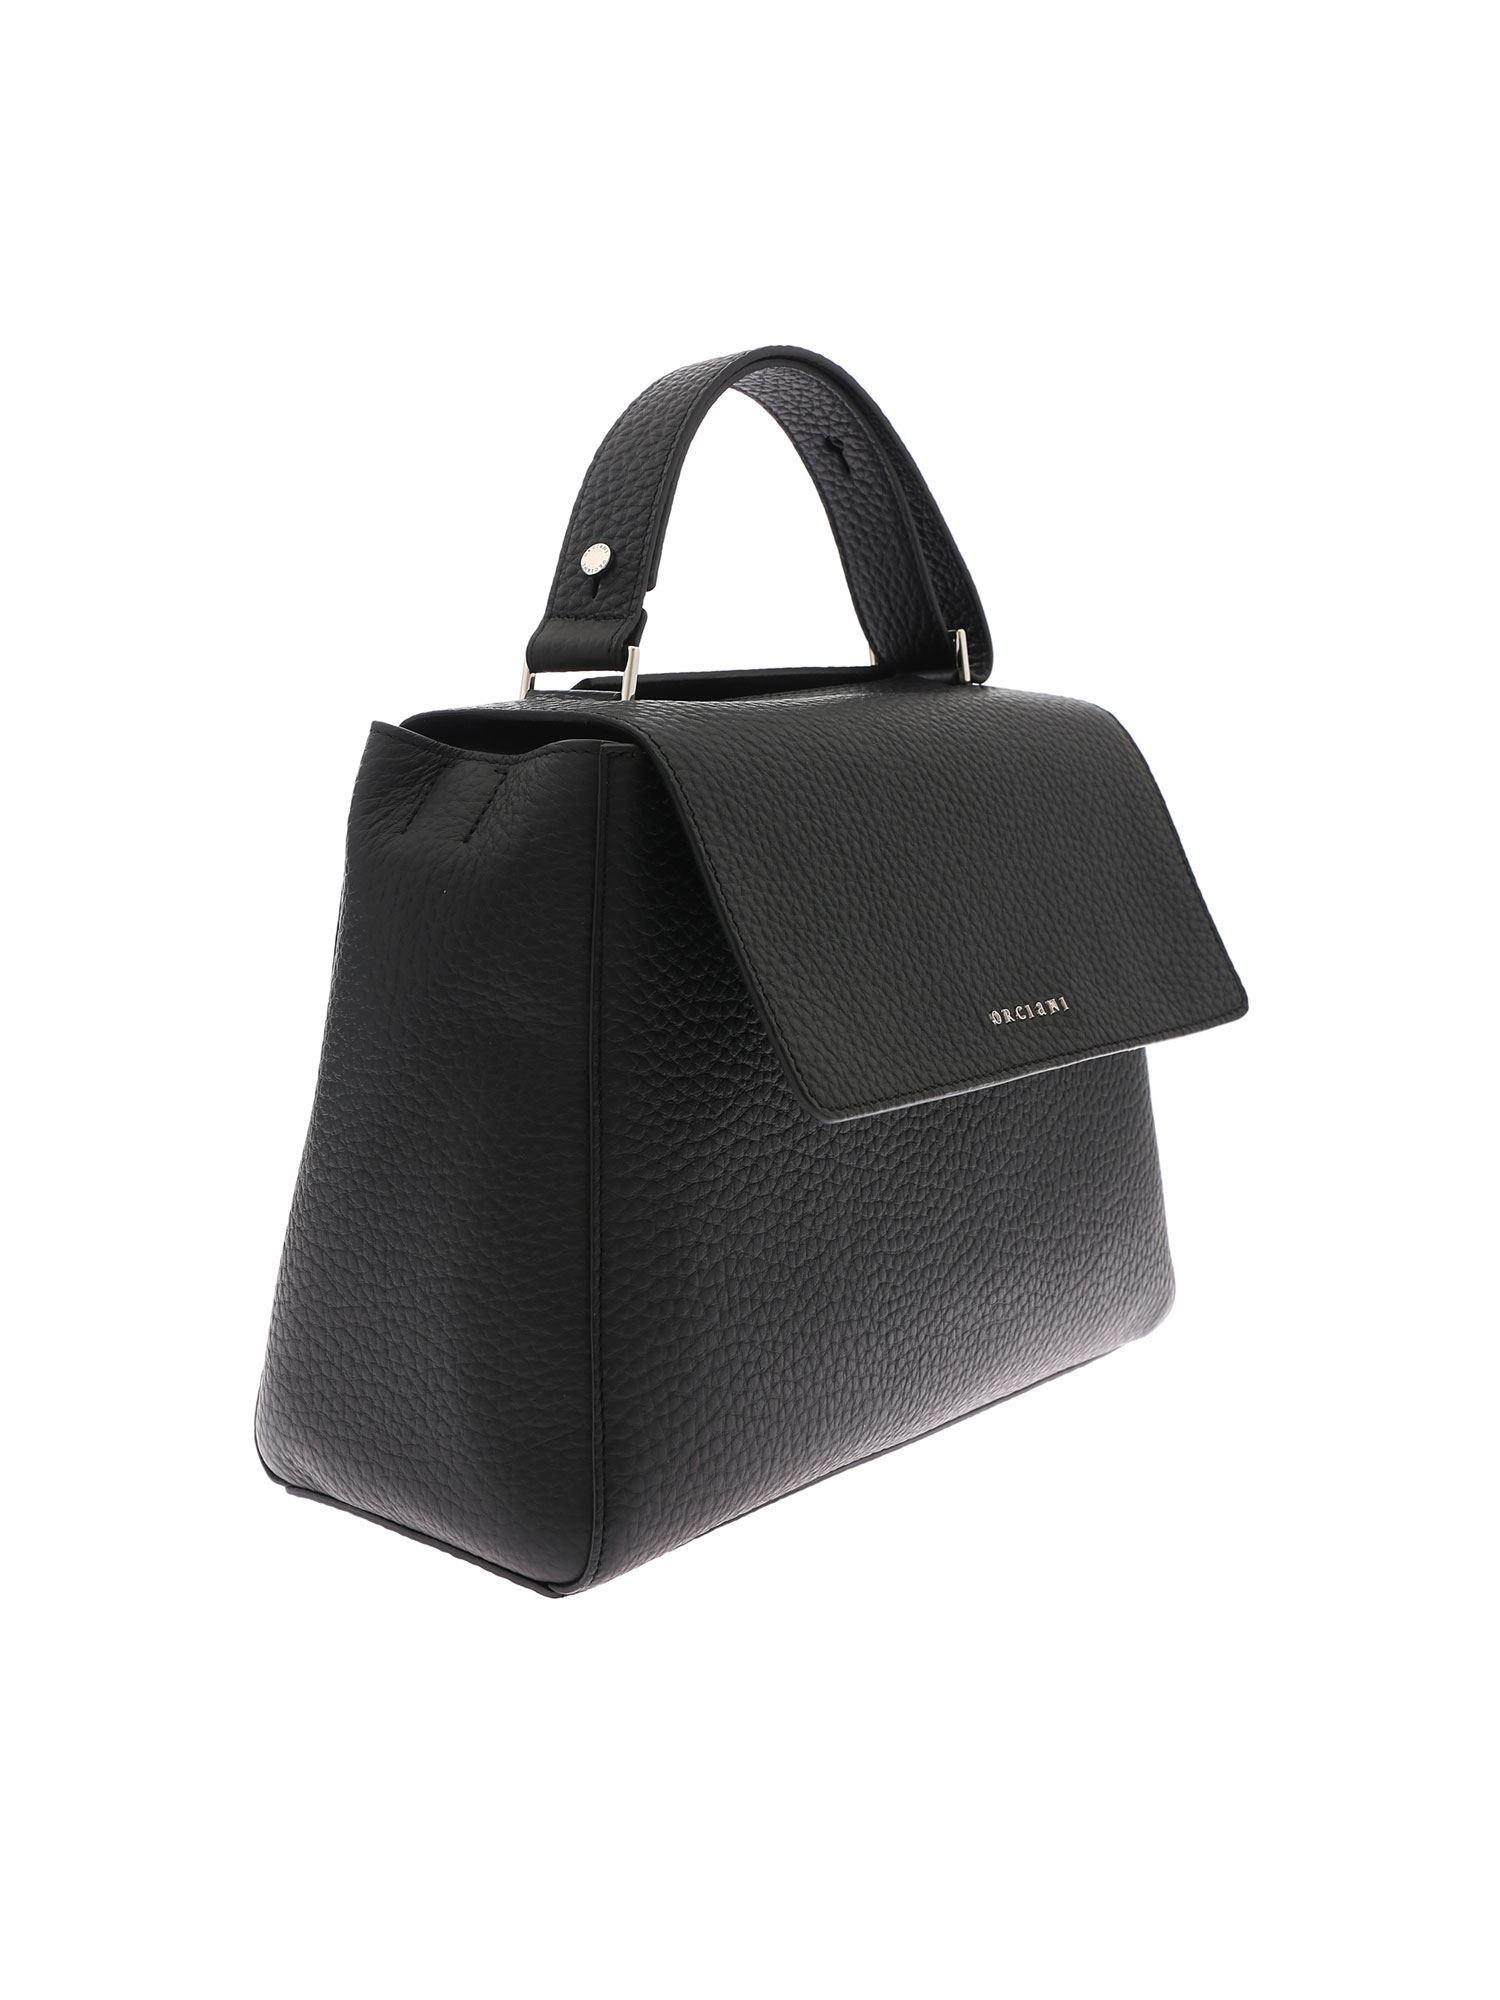 5280a5c0f88f Lyst - Orciani Black Sveva Hand Bag in Black